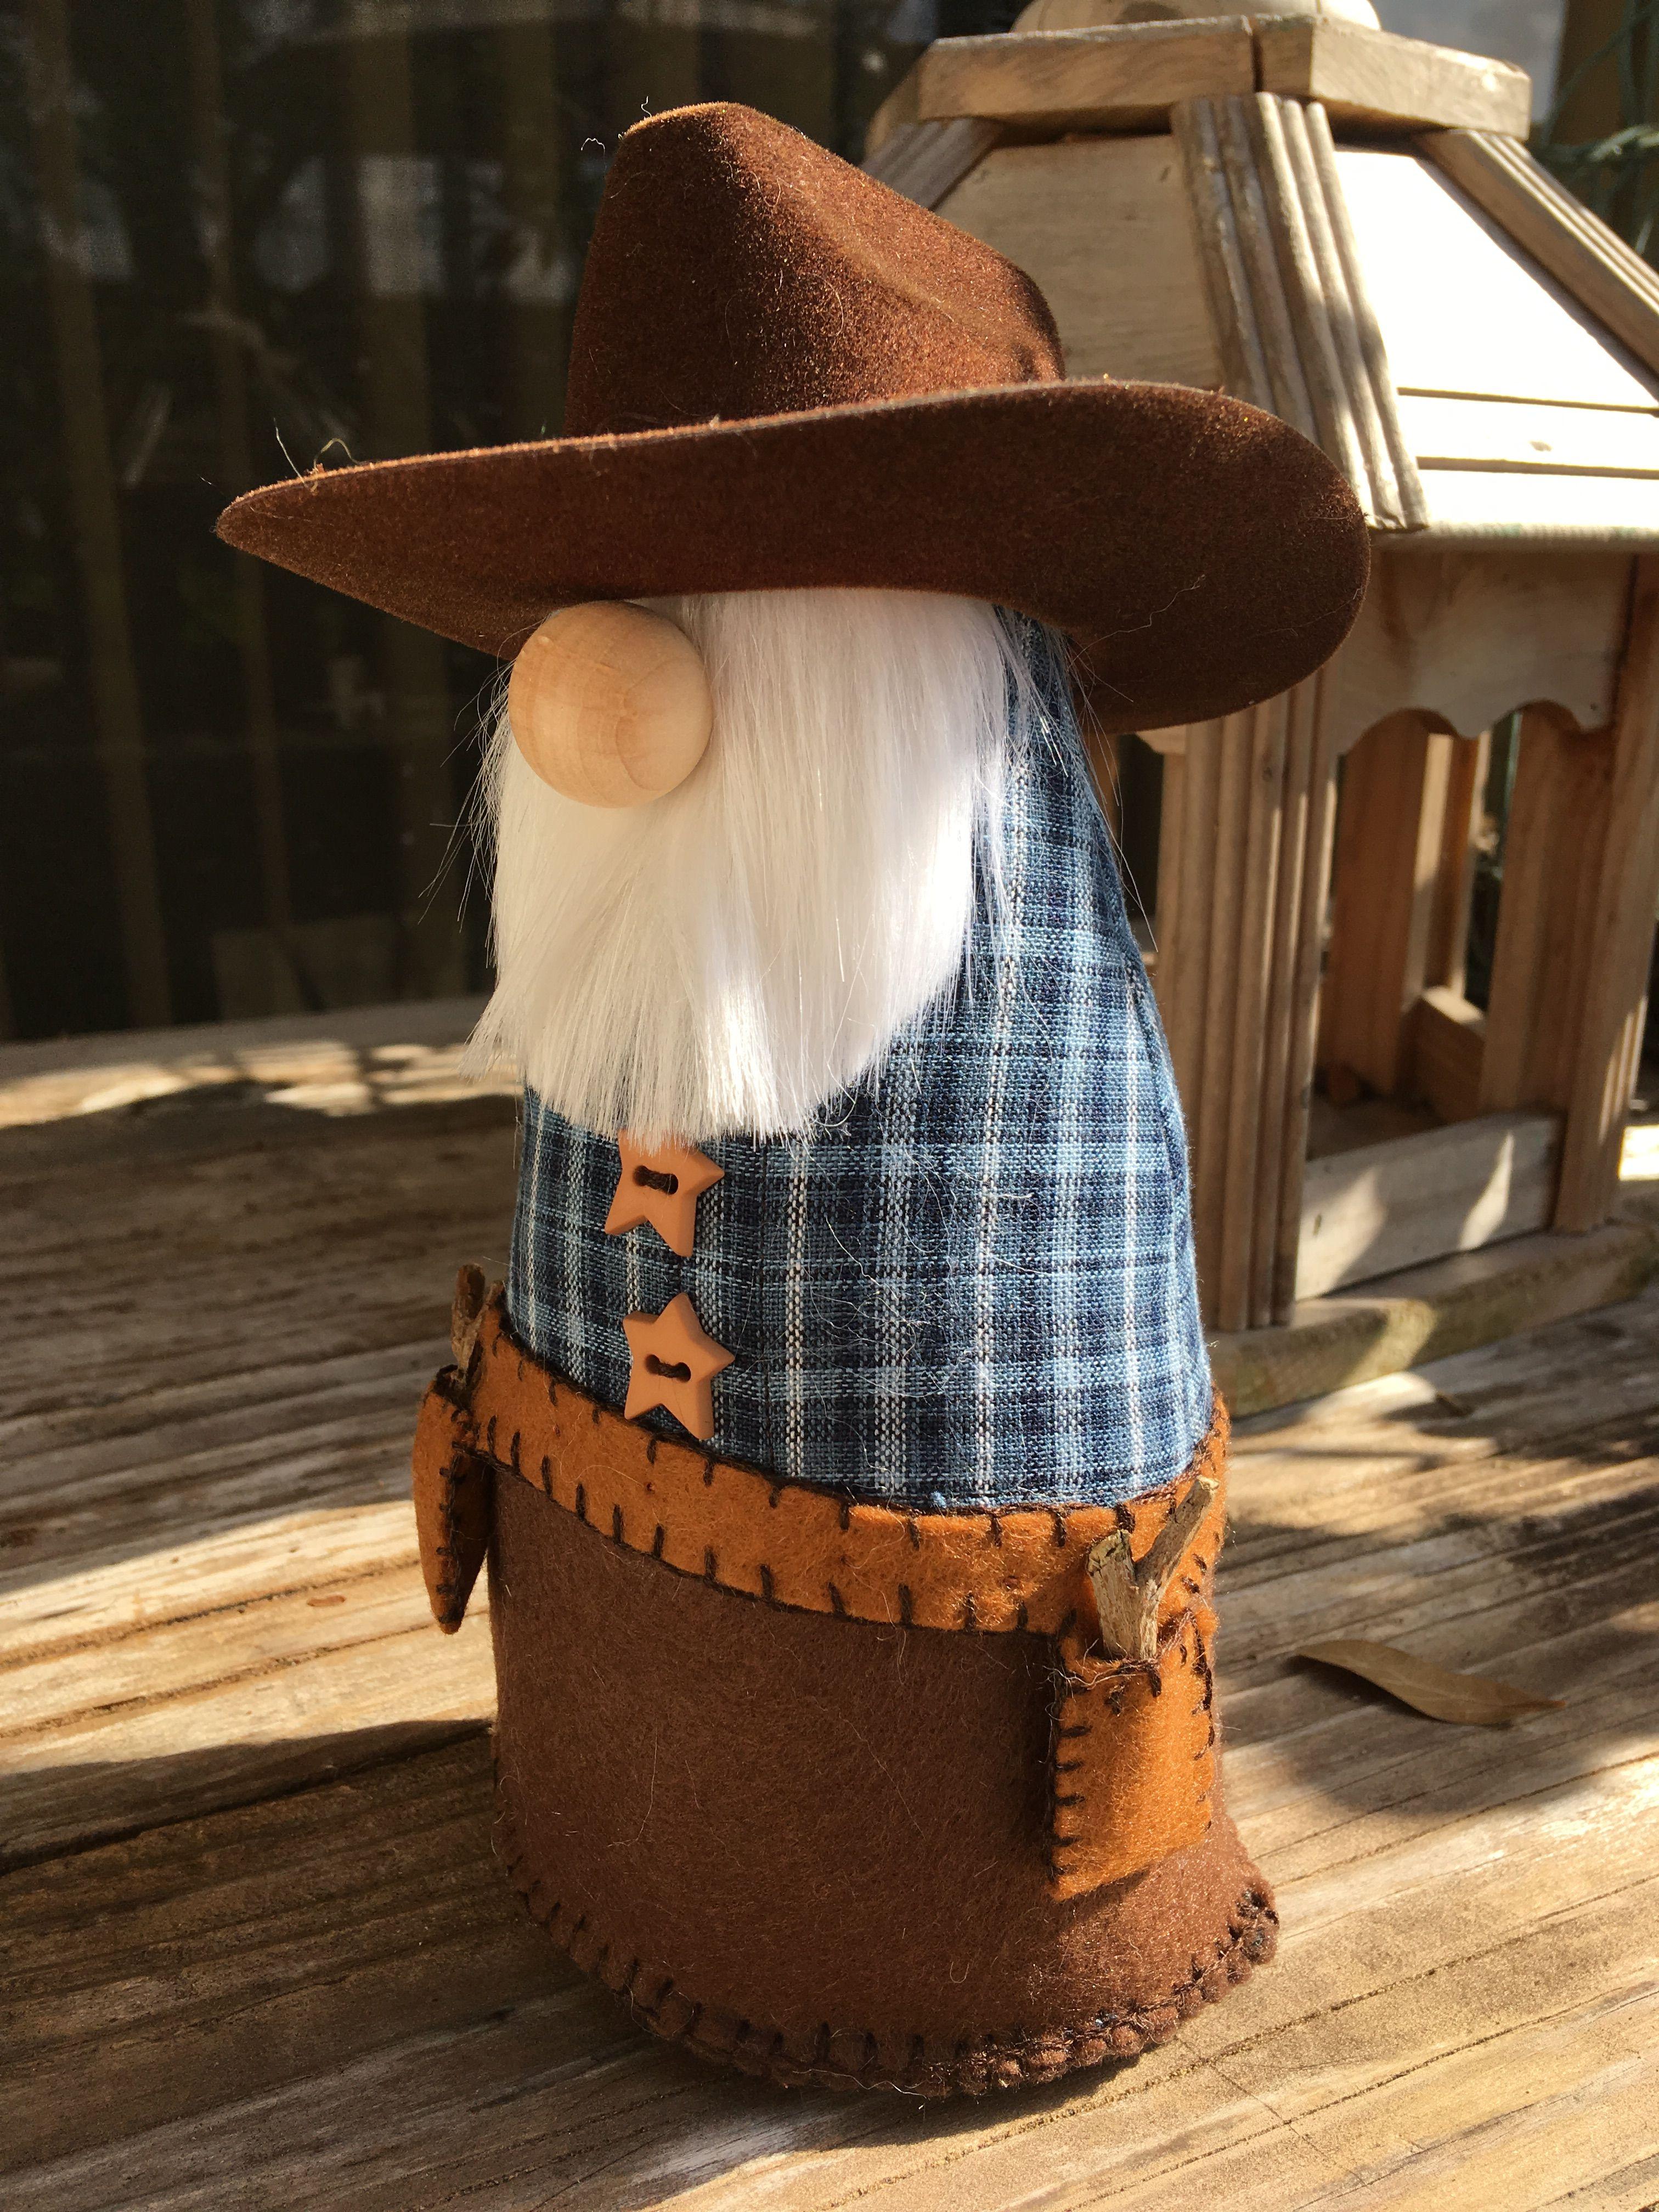 Gnome duke gnomes cowboy hats brown cowboy hat